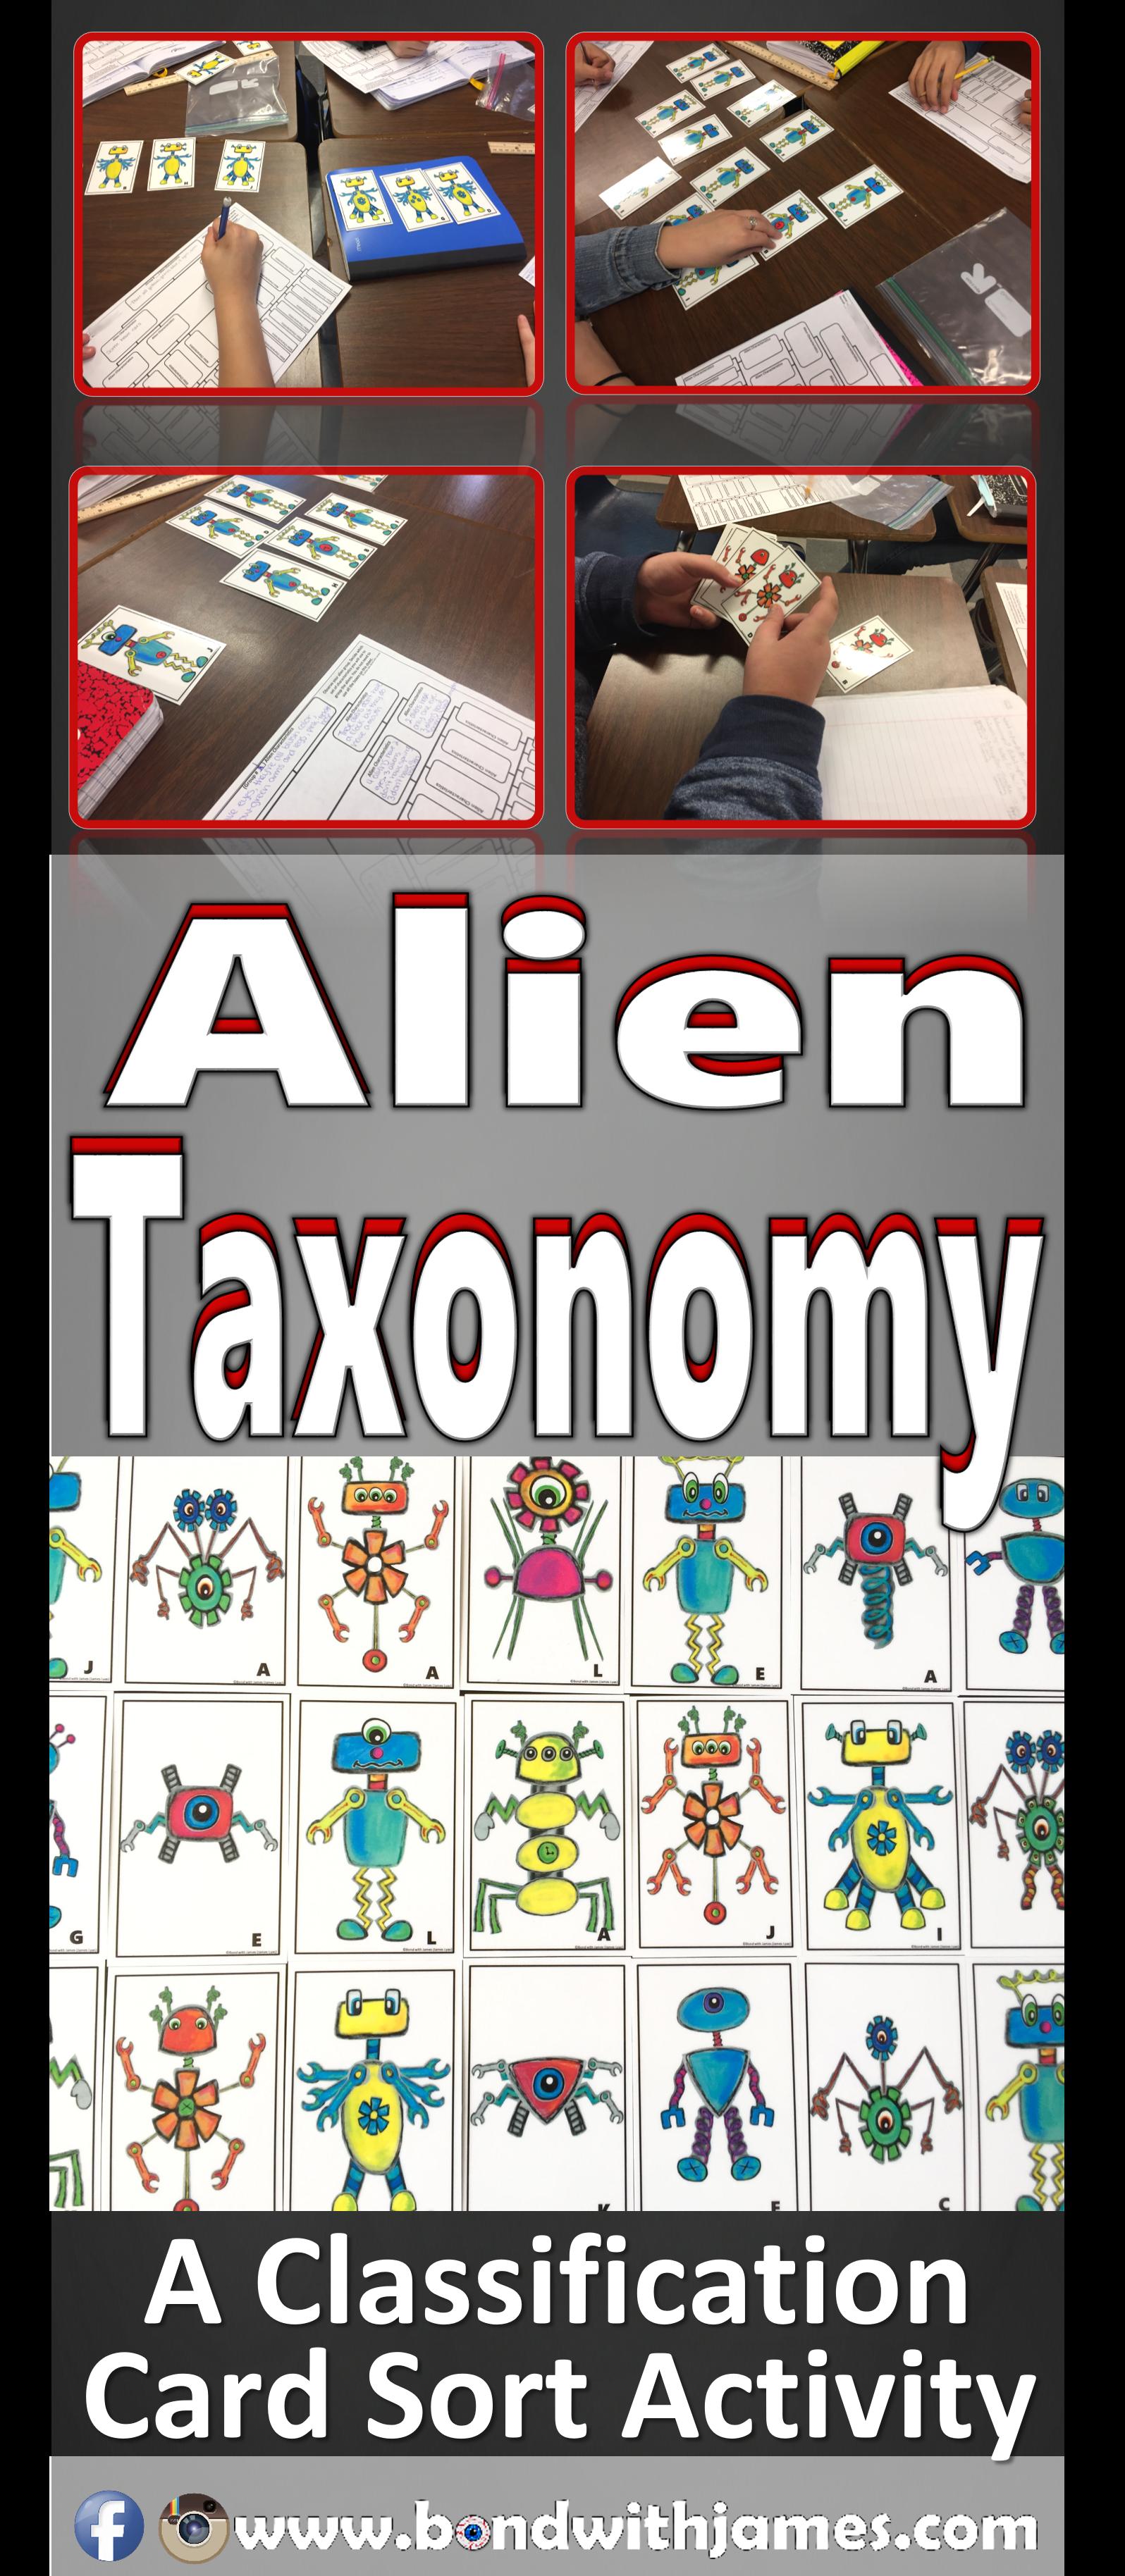 Alien Taxonomy A Classification Card Sort Activity